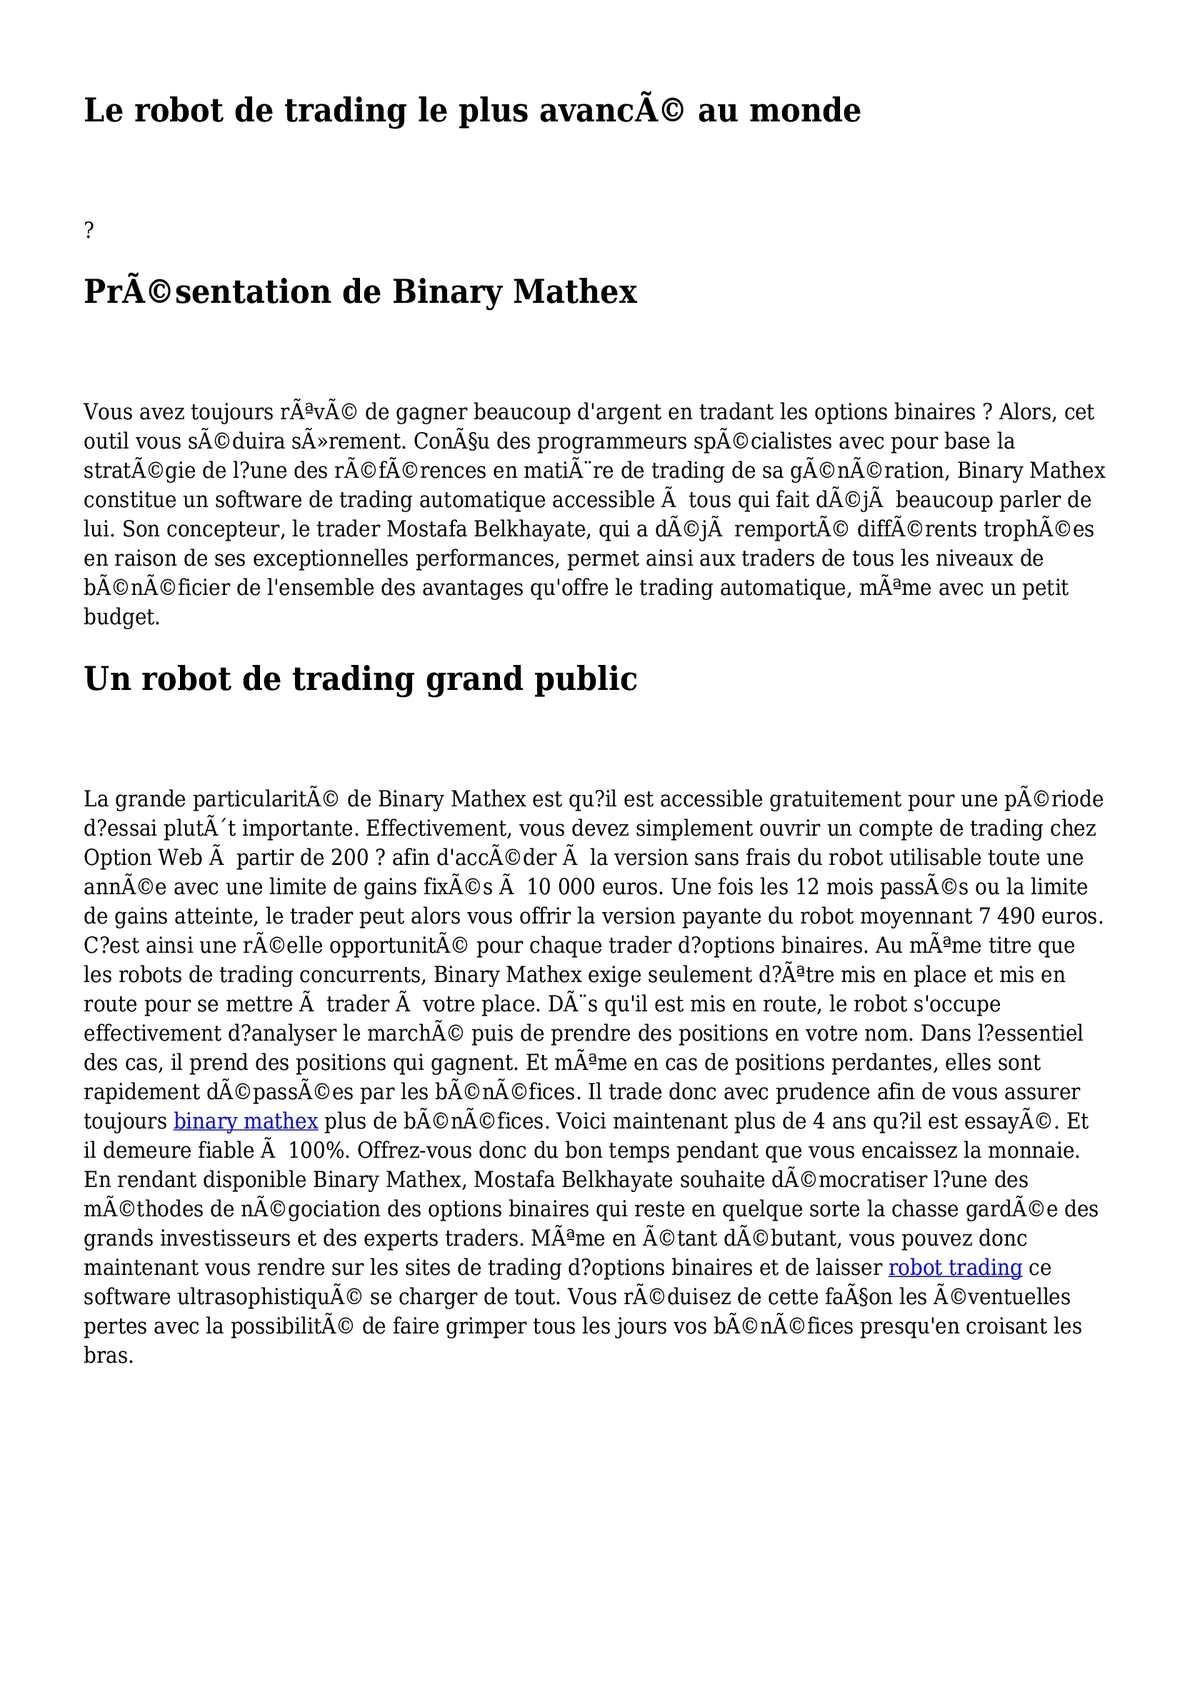 Binary option robot mathex